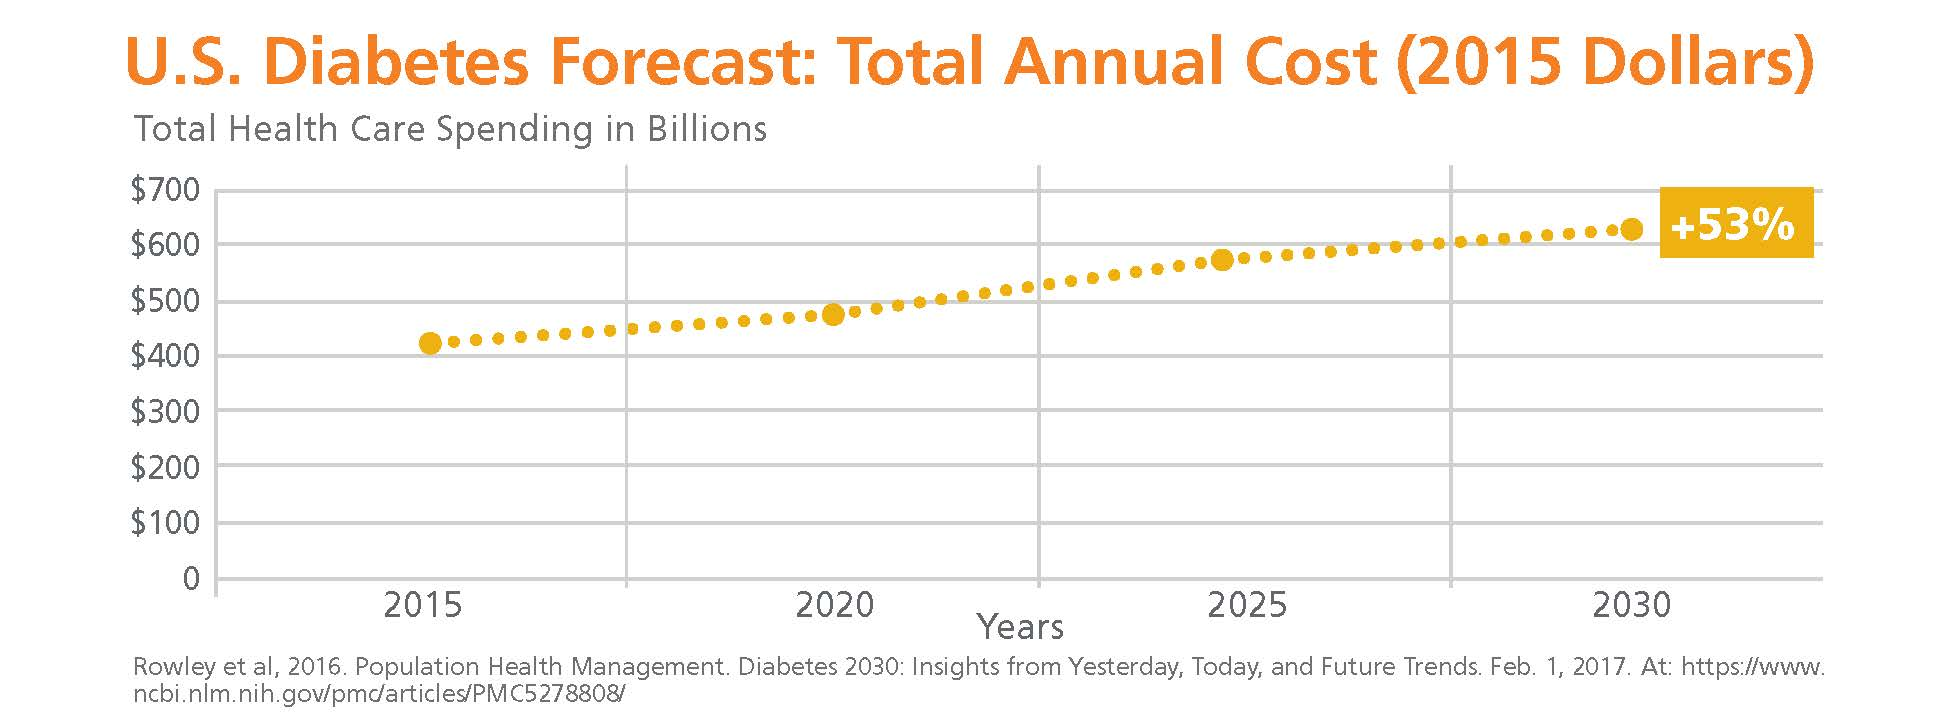 Diabetes cost forecast